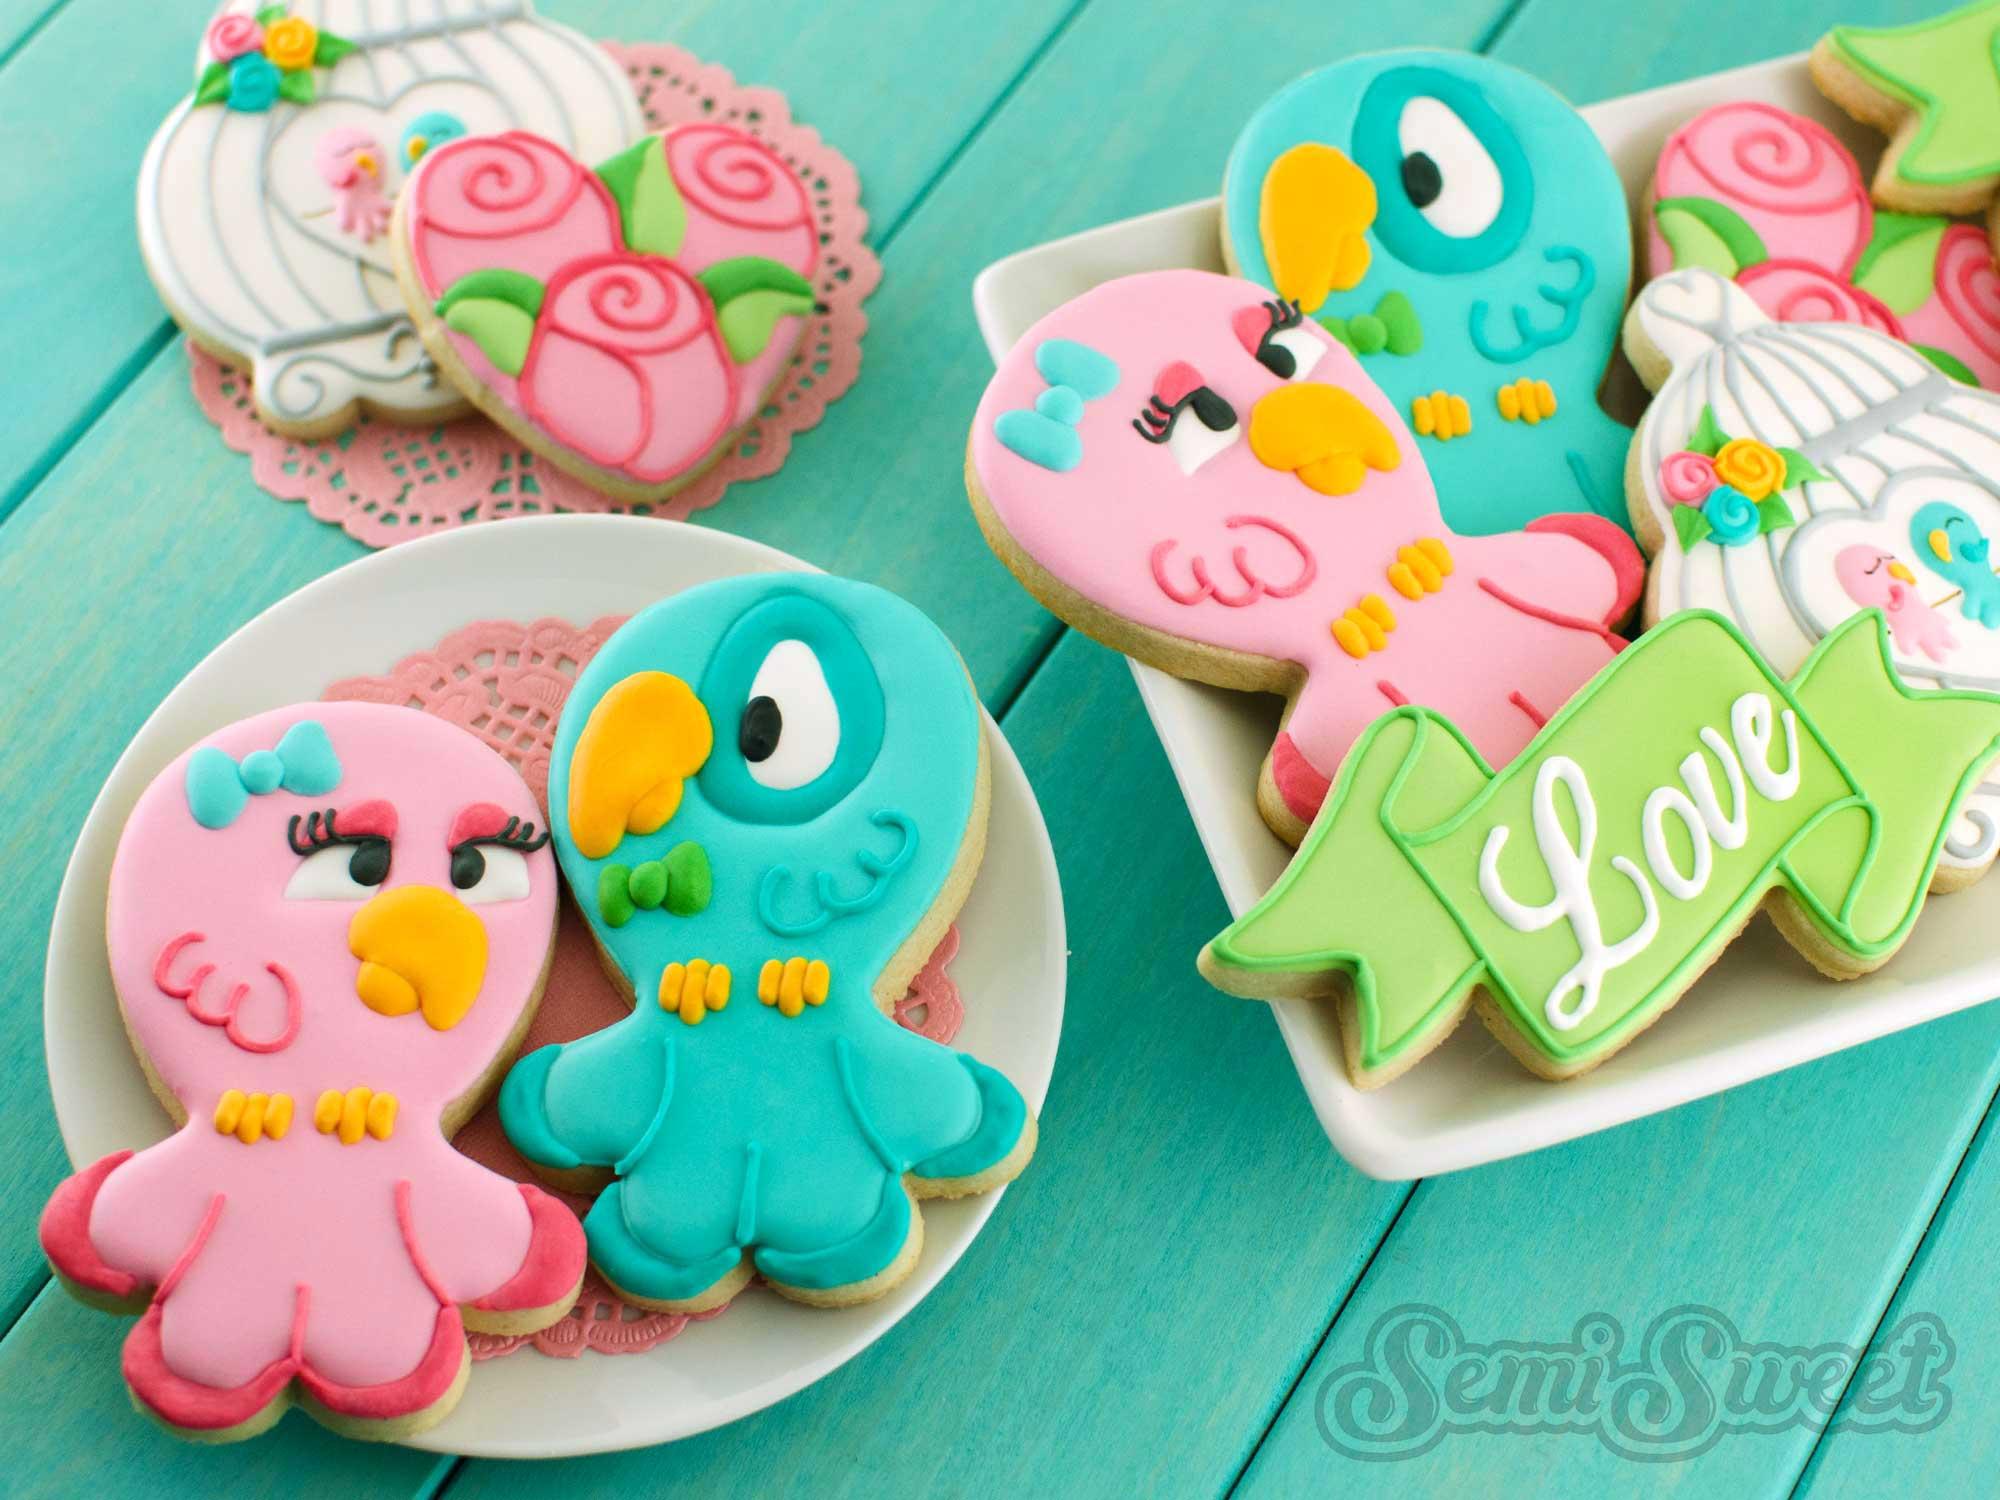 How to Make Love Bird Cookies